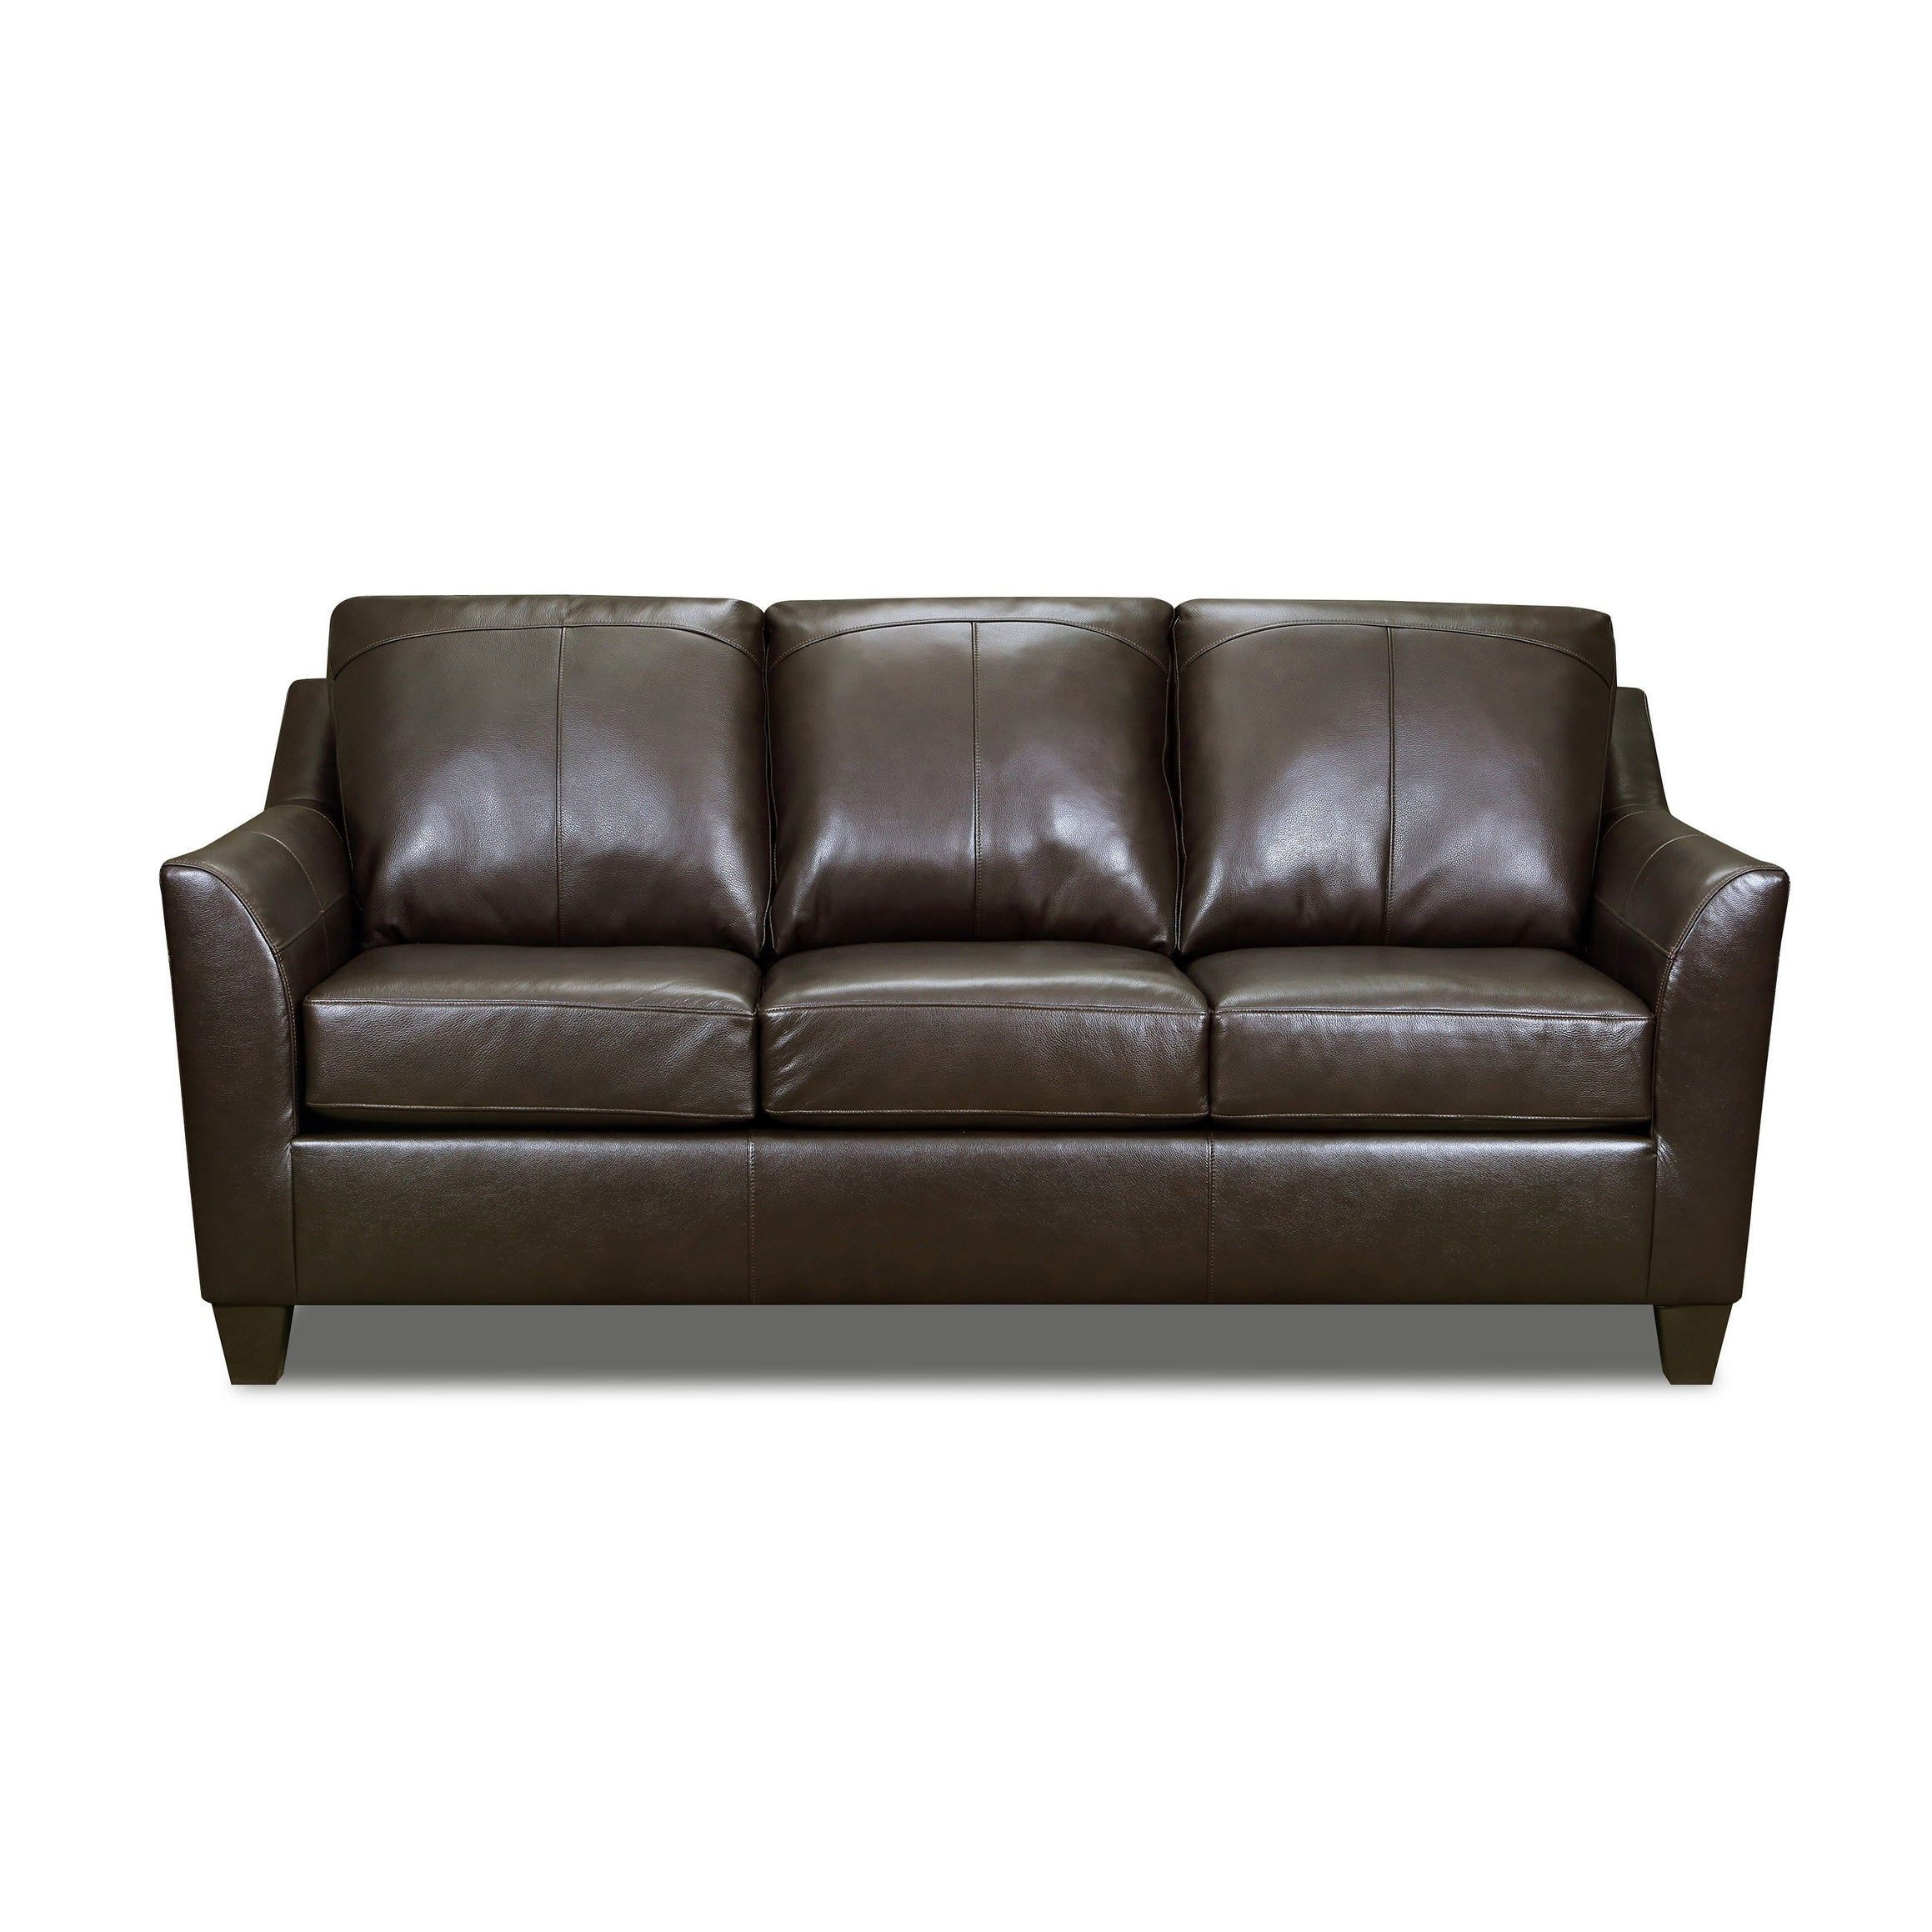 Shop Lance Top Grain Leather Queen Sleeper Sofa On Sale Free